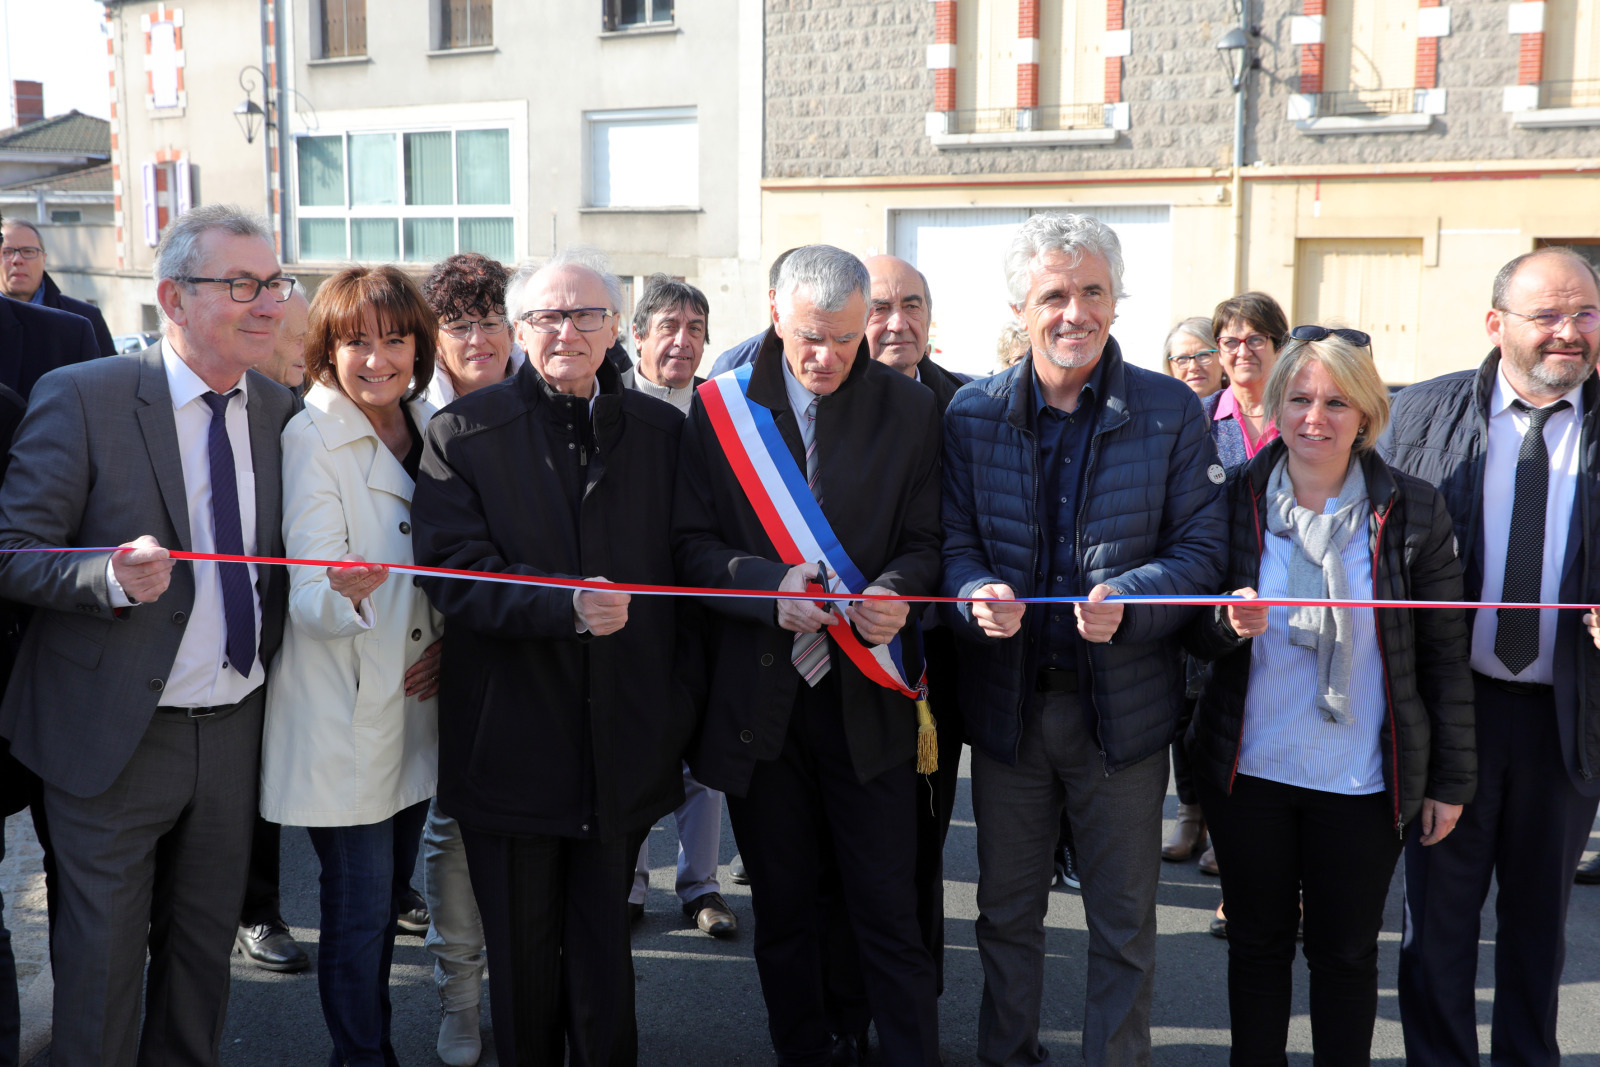 https://www.loire.fr/jcms/lw_1246621/le-centre-bourg-de-panissieres-inaugure?xtor=RSS-40